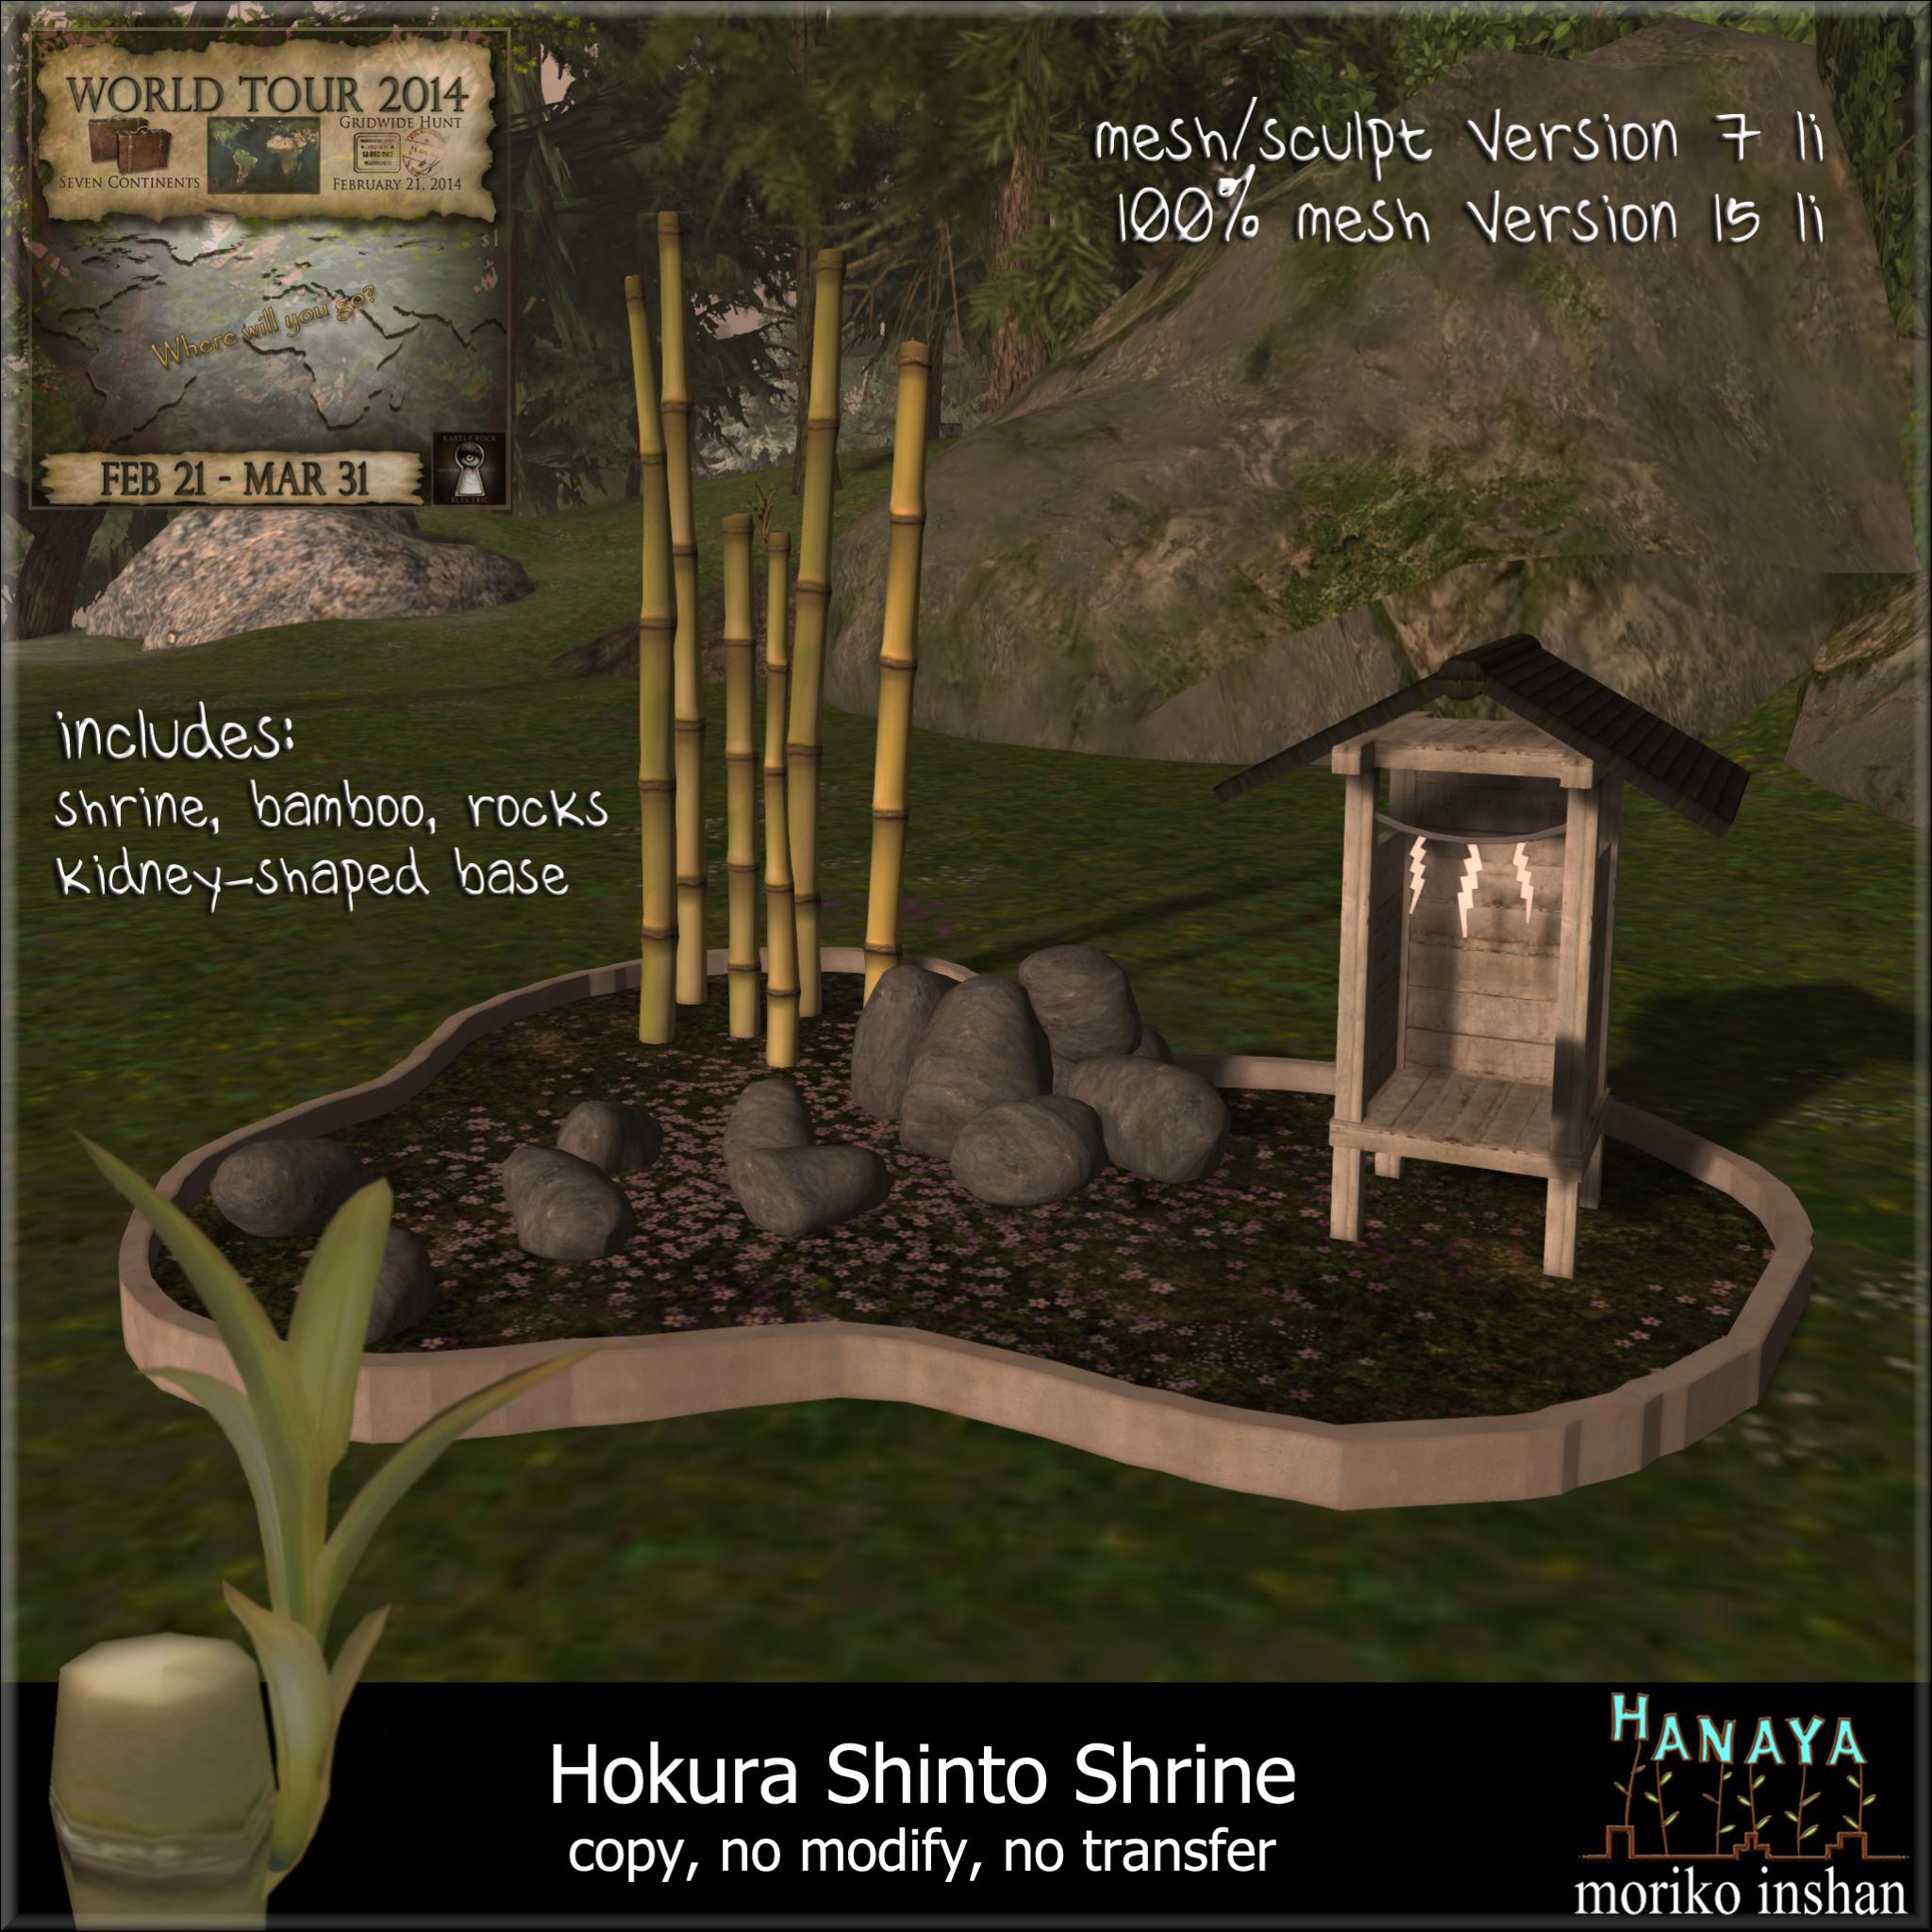 Hanaya-Hokura-Shinto-Shrine-for-hunt